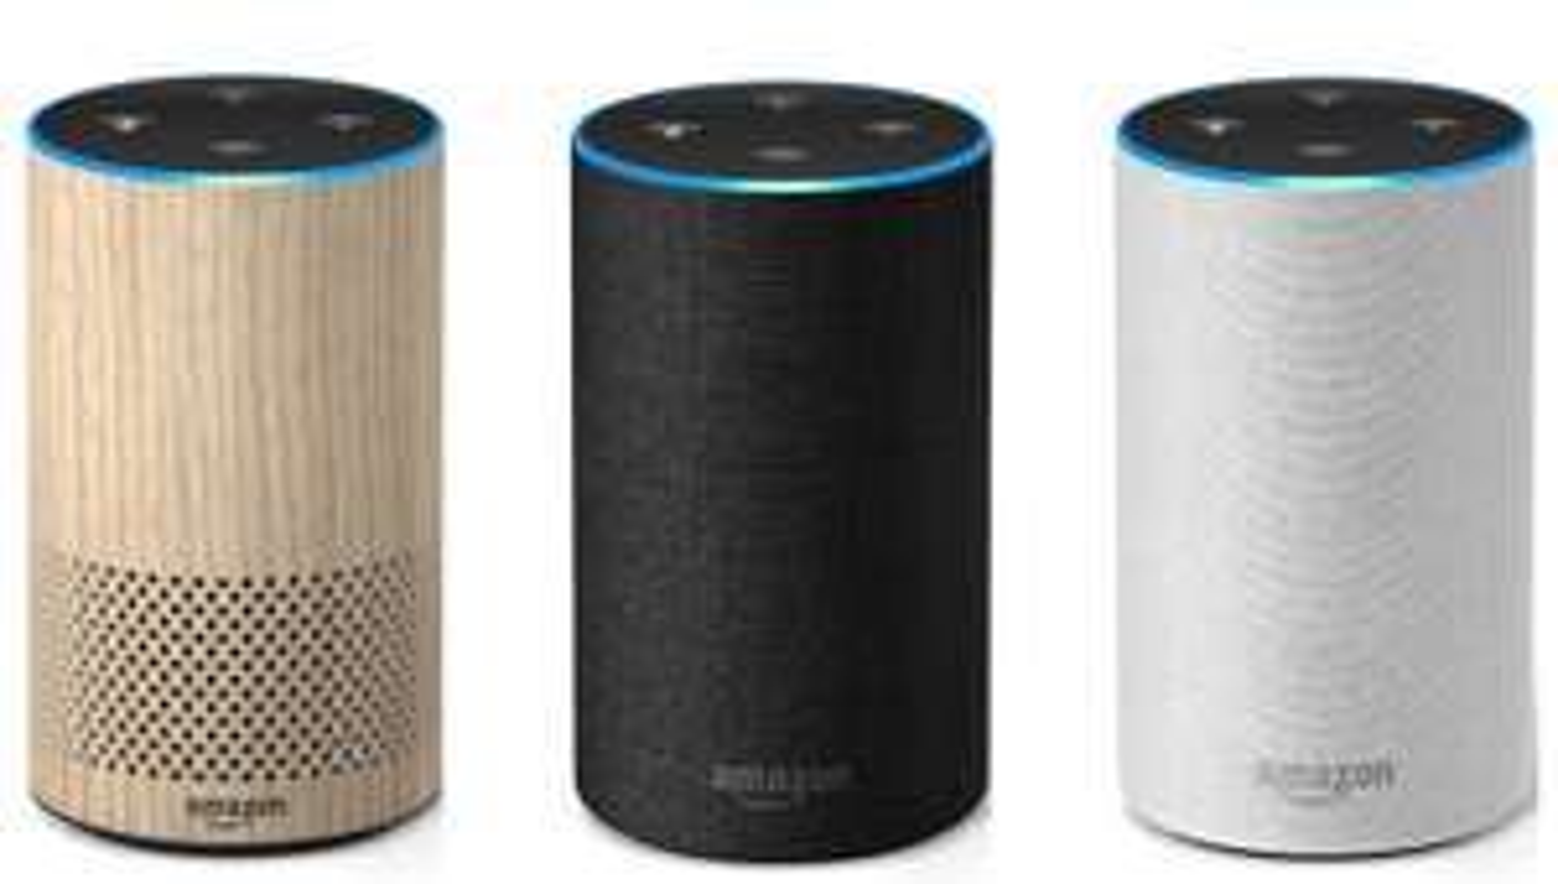 [Certified Refurbished] Amazon Echo (2nd Gen.) - Oak Finish / Charcoal Fabric / Sandstone Fabric £59.99 with 1-year warranty as New @ Amazon